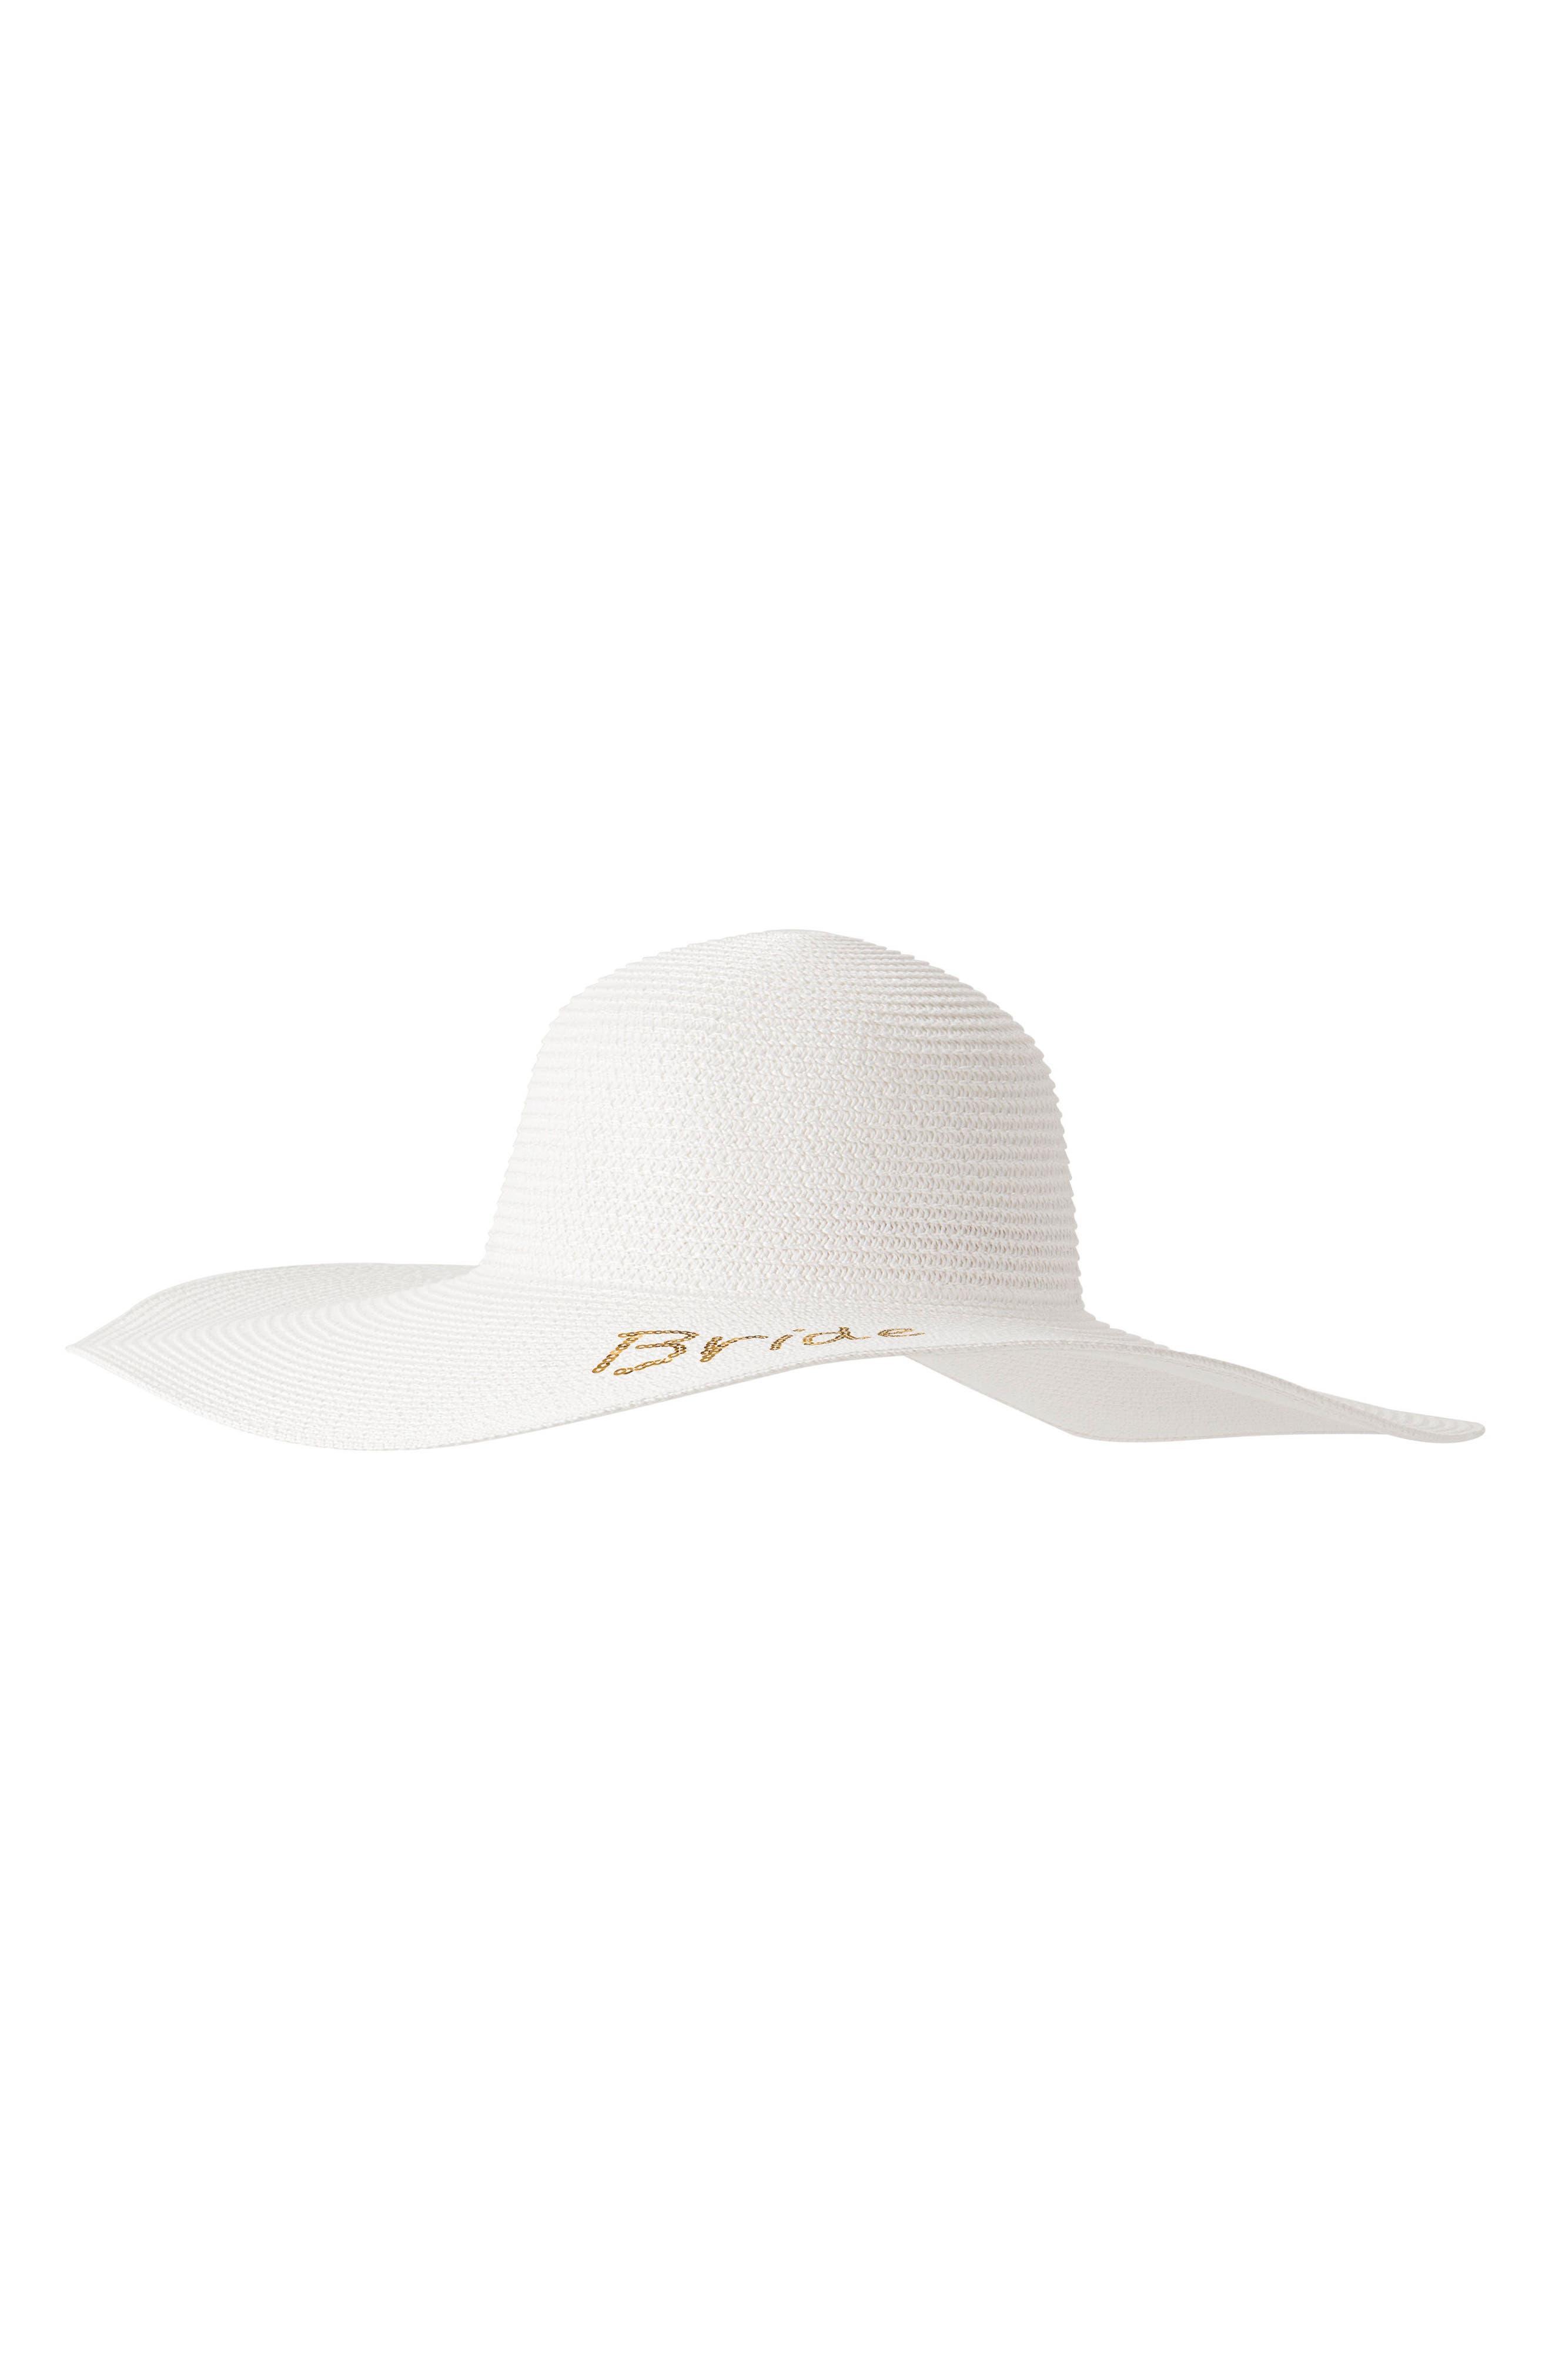 Bride Sequin Straw Hat,                             Alternate thumbnail 2, color,                             Gold